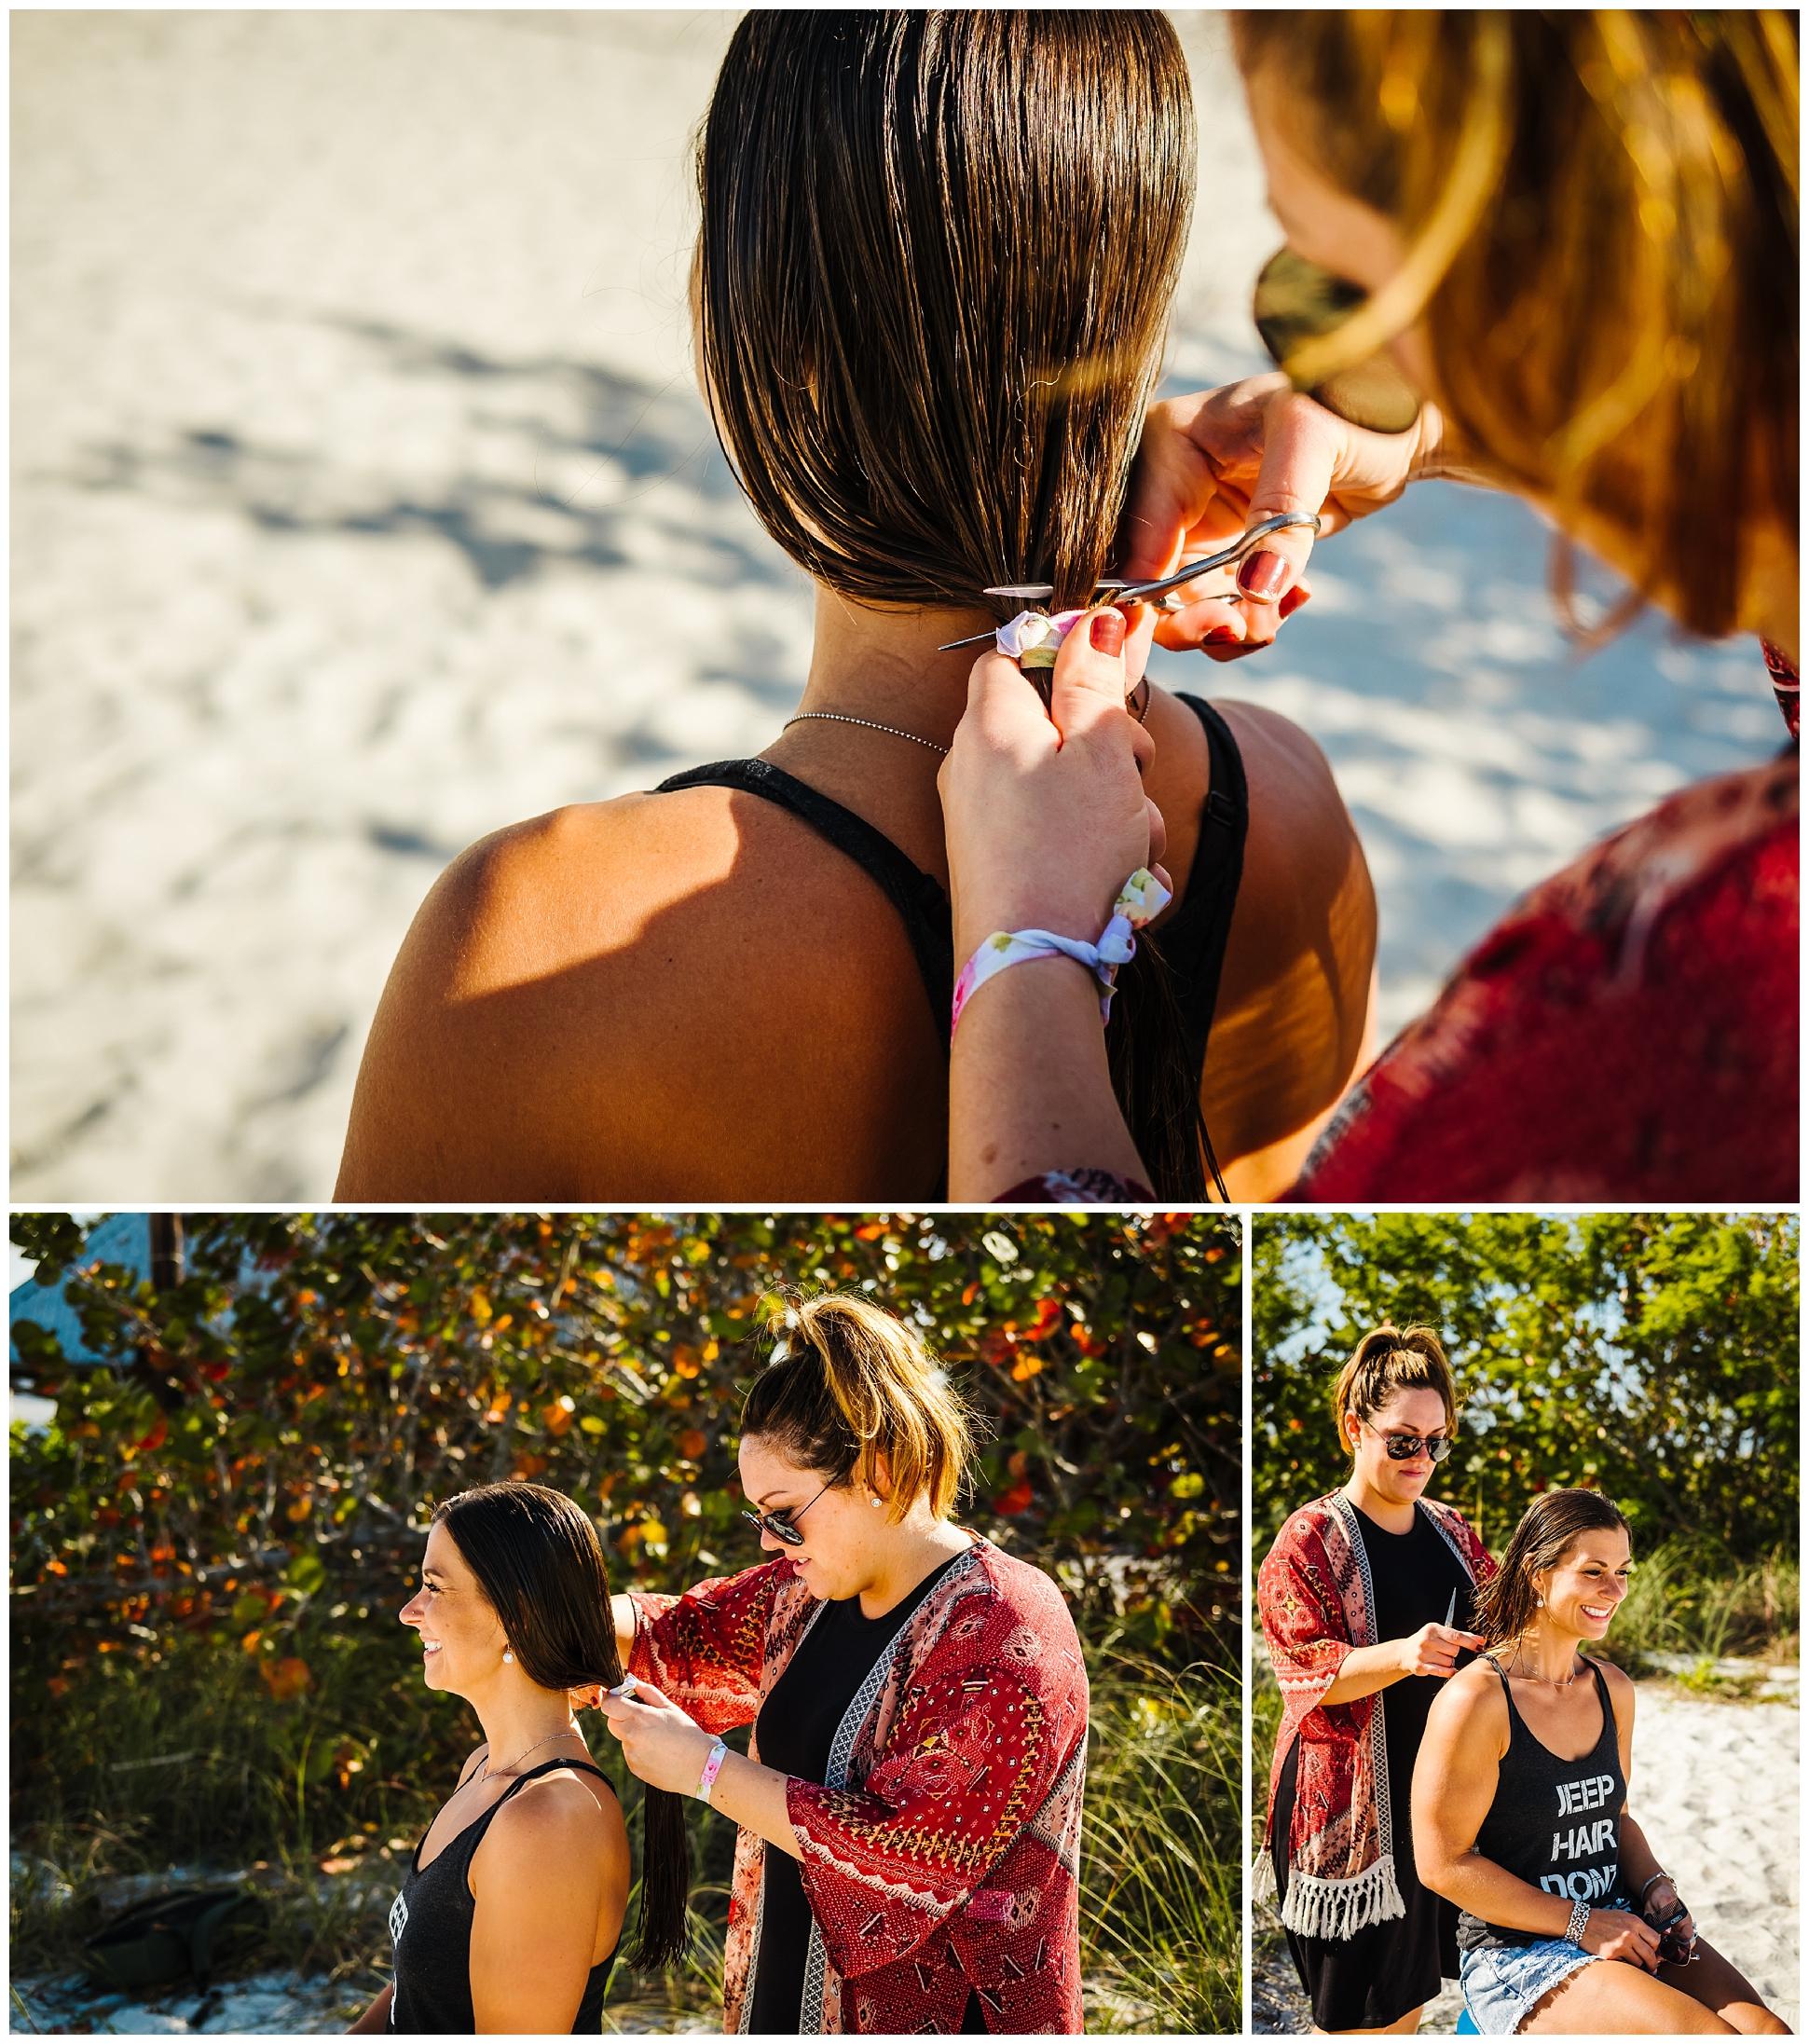 Tampa-wedding-photographer-locks-of-love-bride-hair-donation-cancer-awareness_0002.jpg